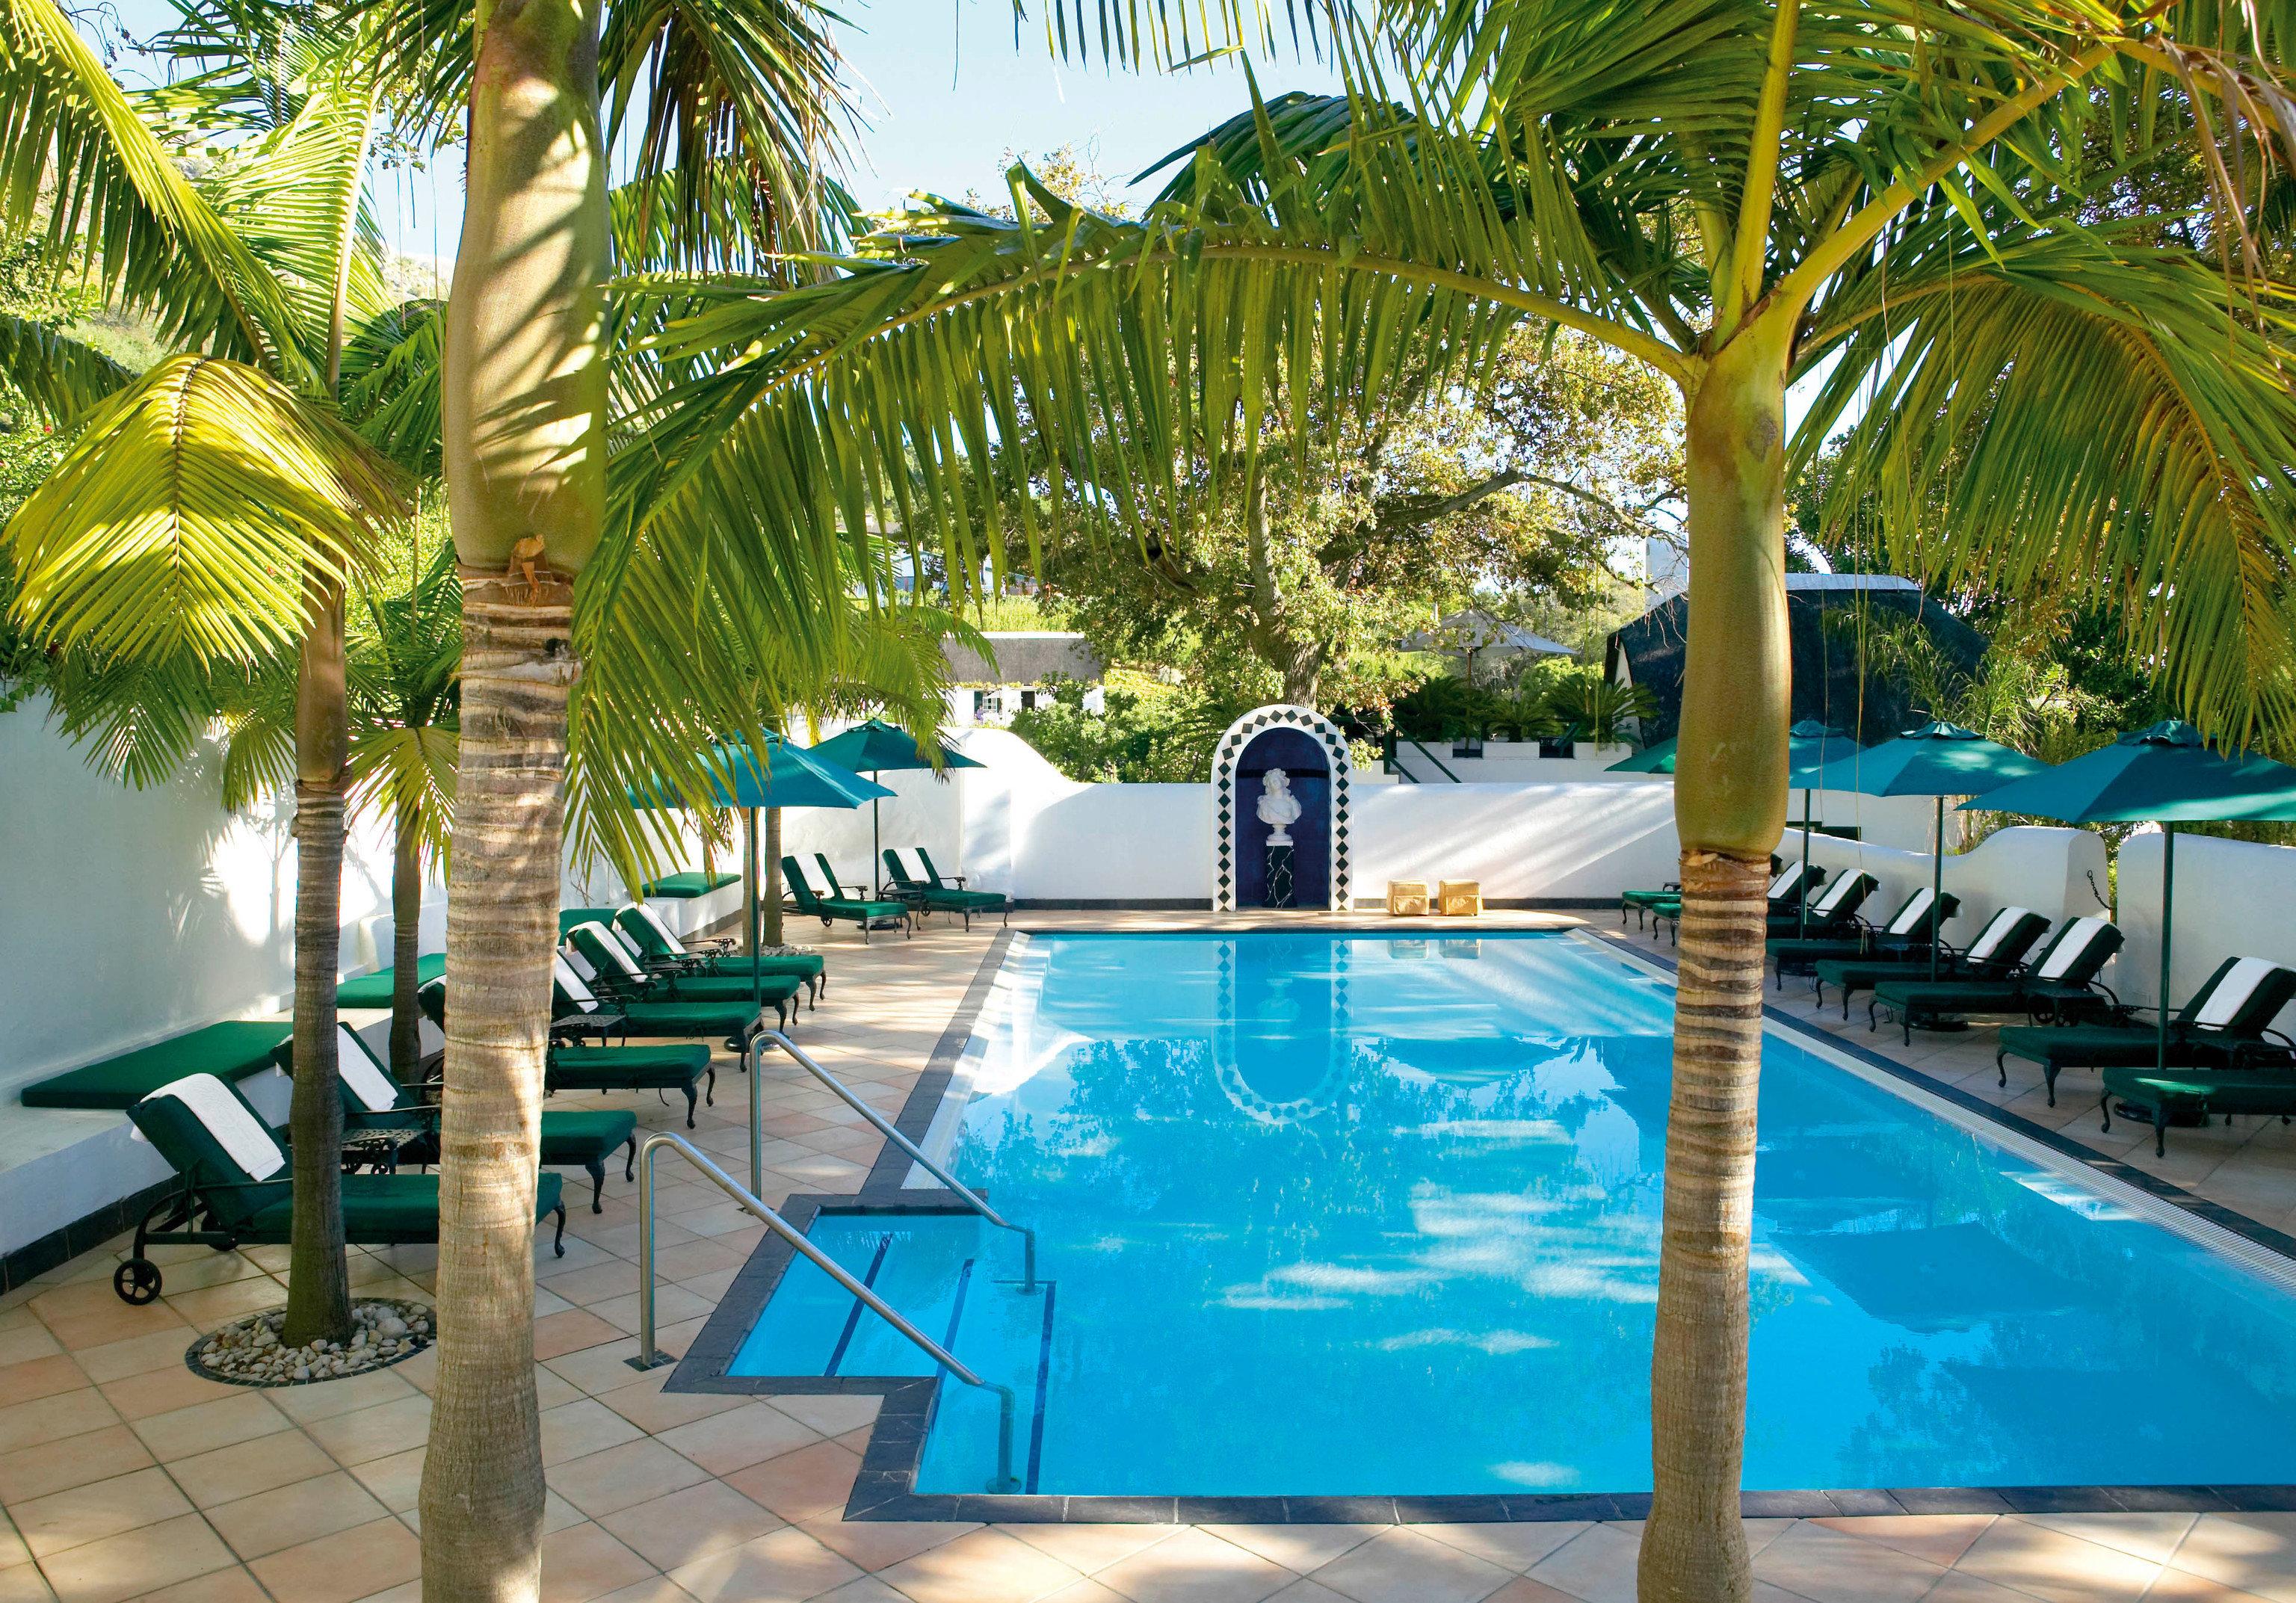 tree swimming pool leisure Resort property palm caribbean Pool Villa condominium plant arecales backyard